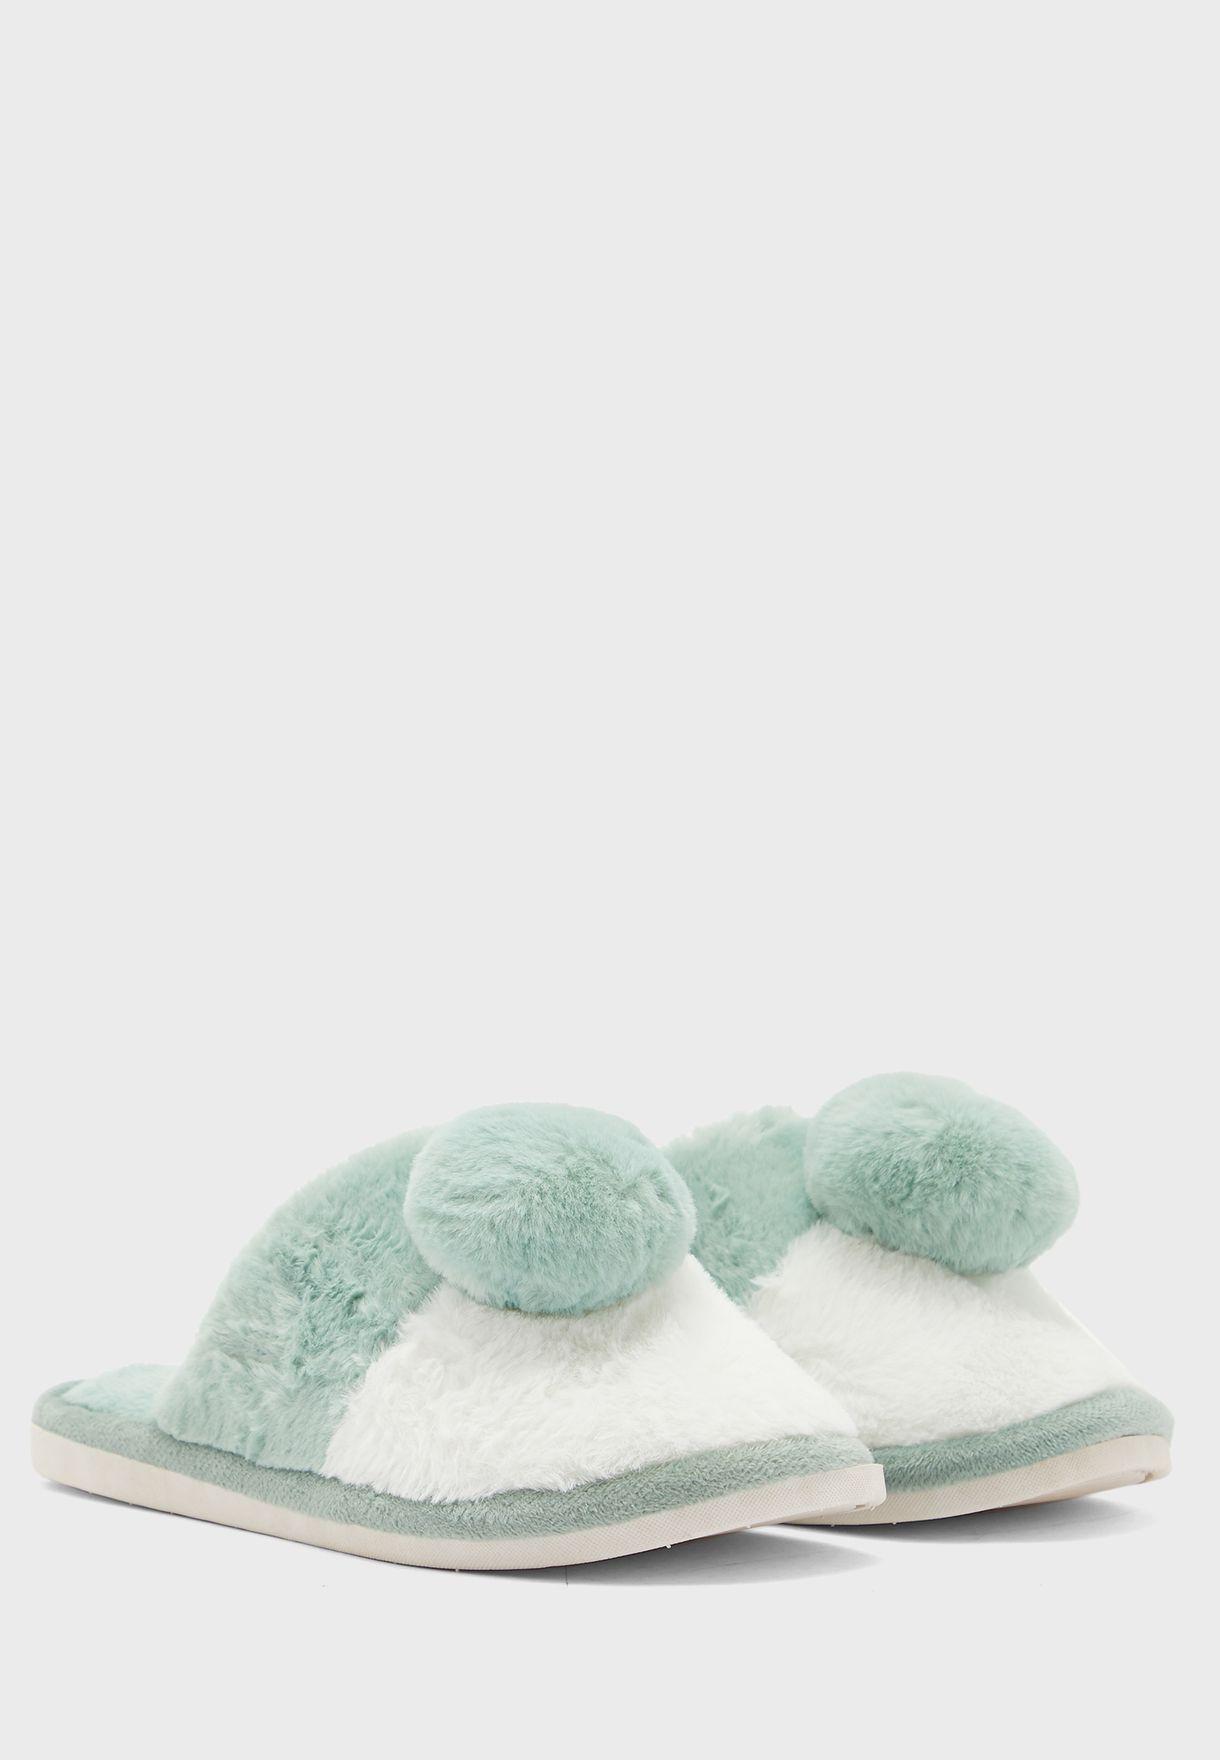 Colourblock Pom Pom Mule Bedroom Slippers